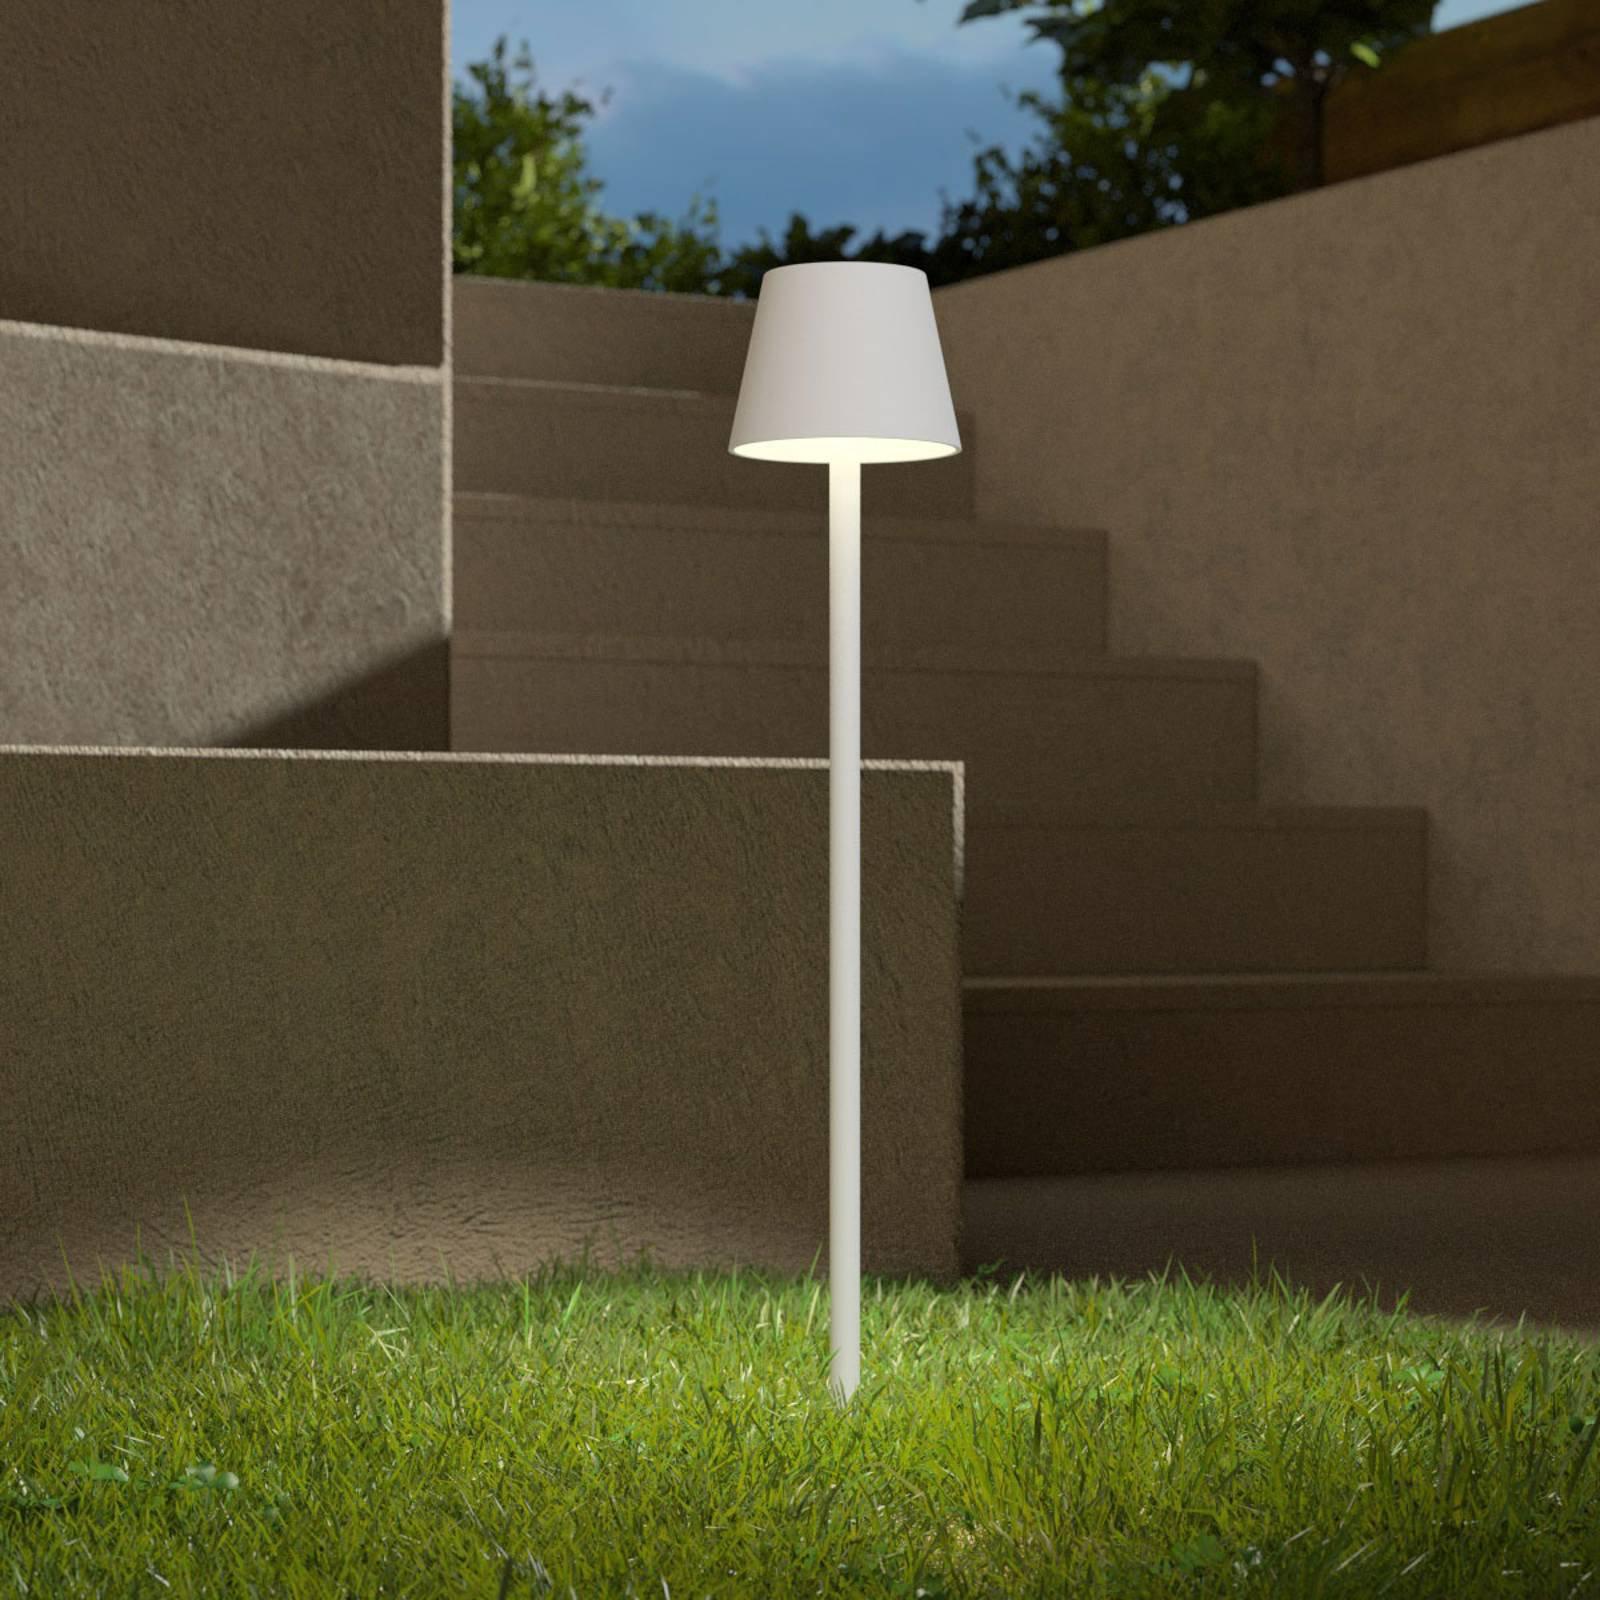 LED-lampe med jordspyd Poldina batteri hvit 85cm